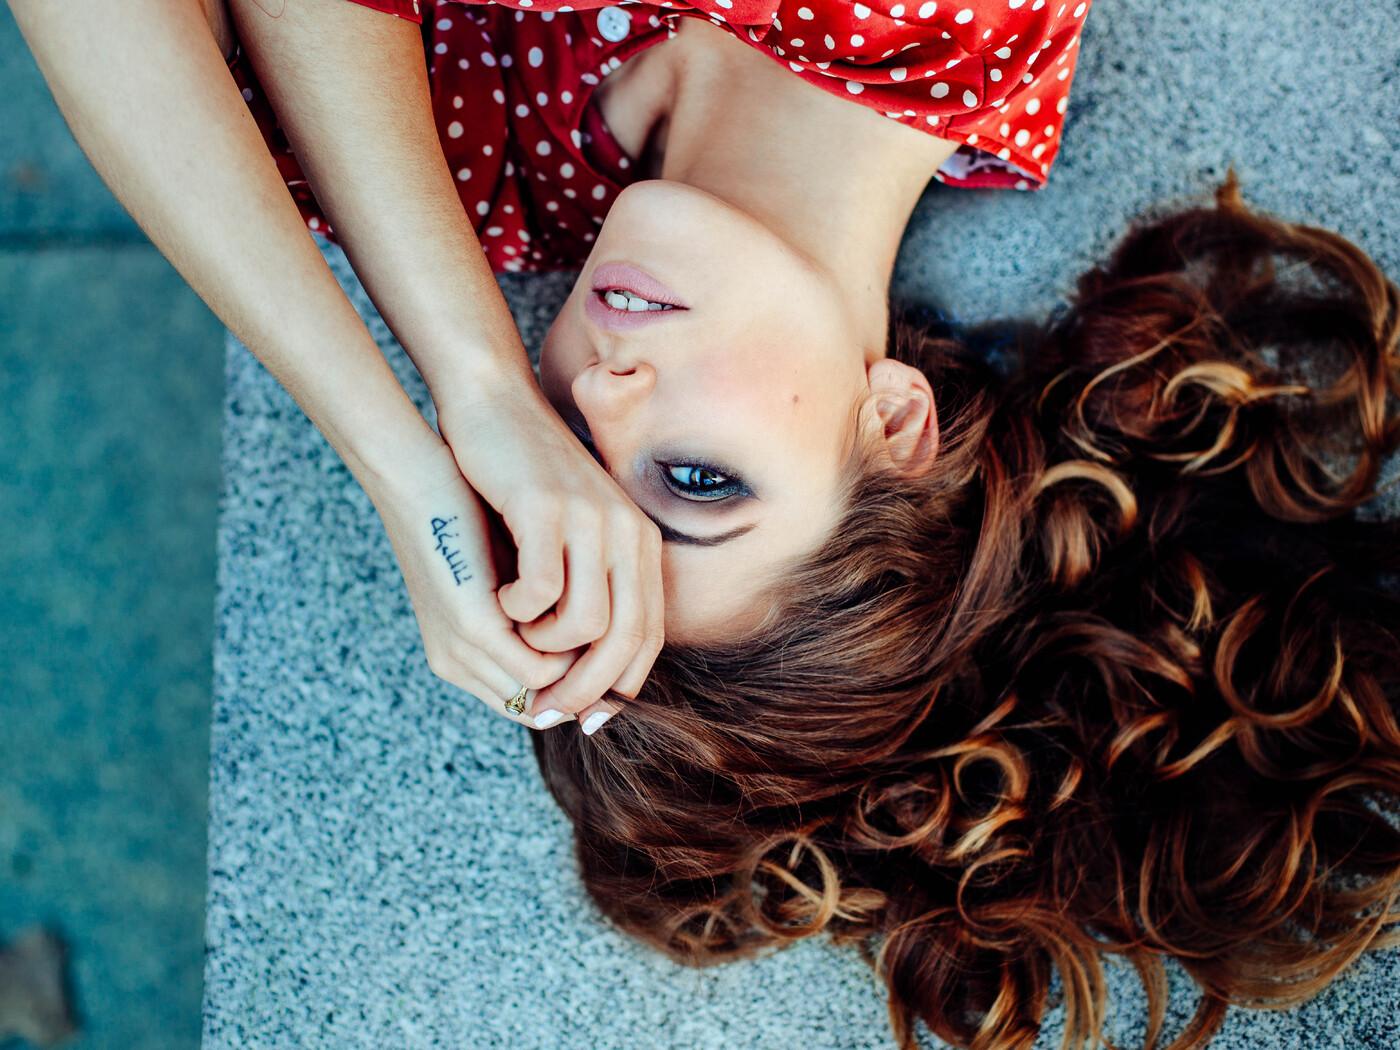 girl-lying-down-one-eye-covered-8k-x4.jpg